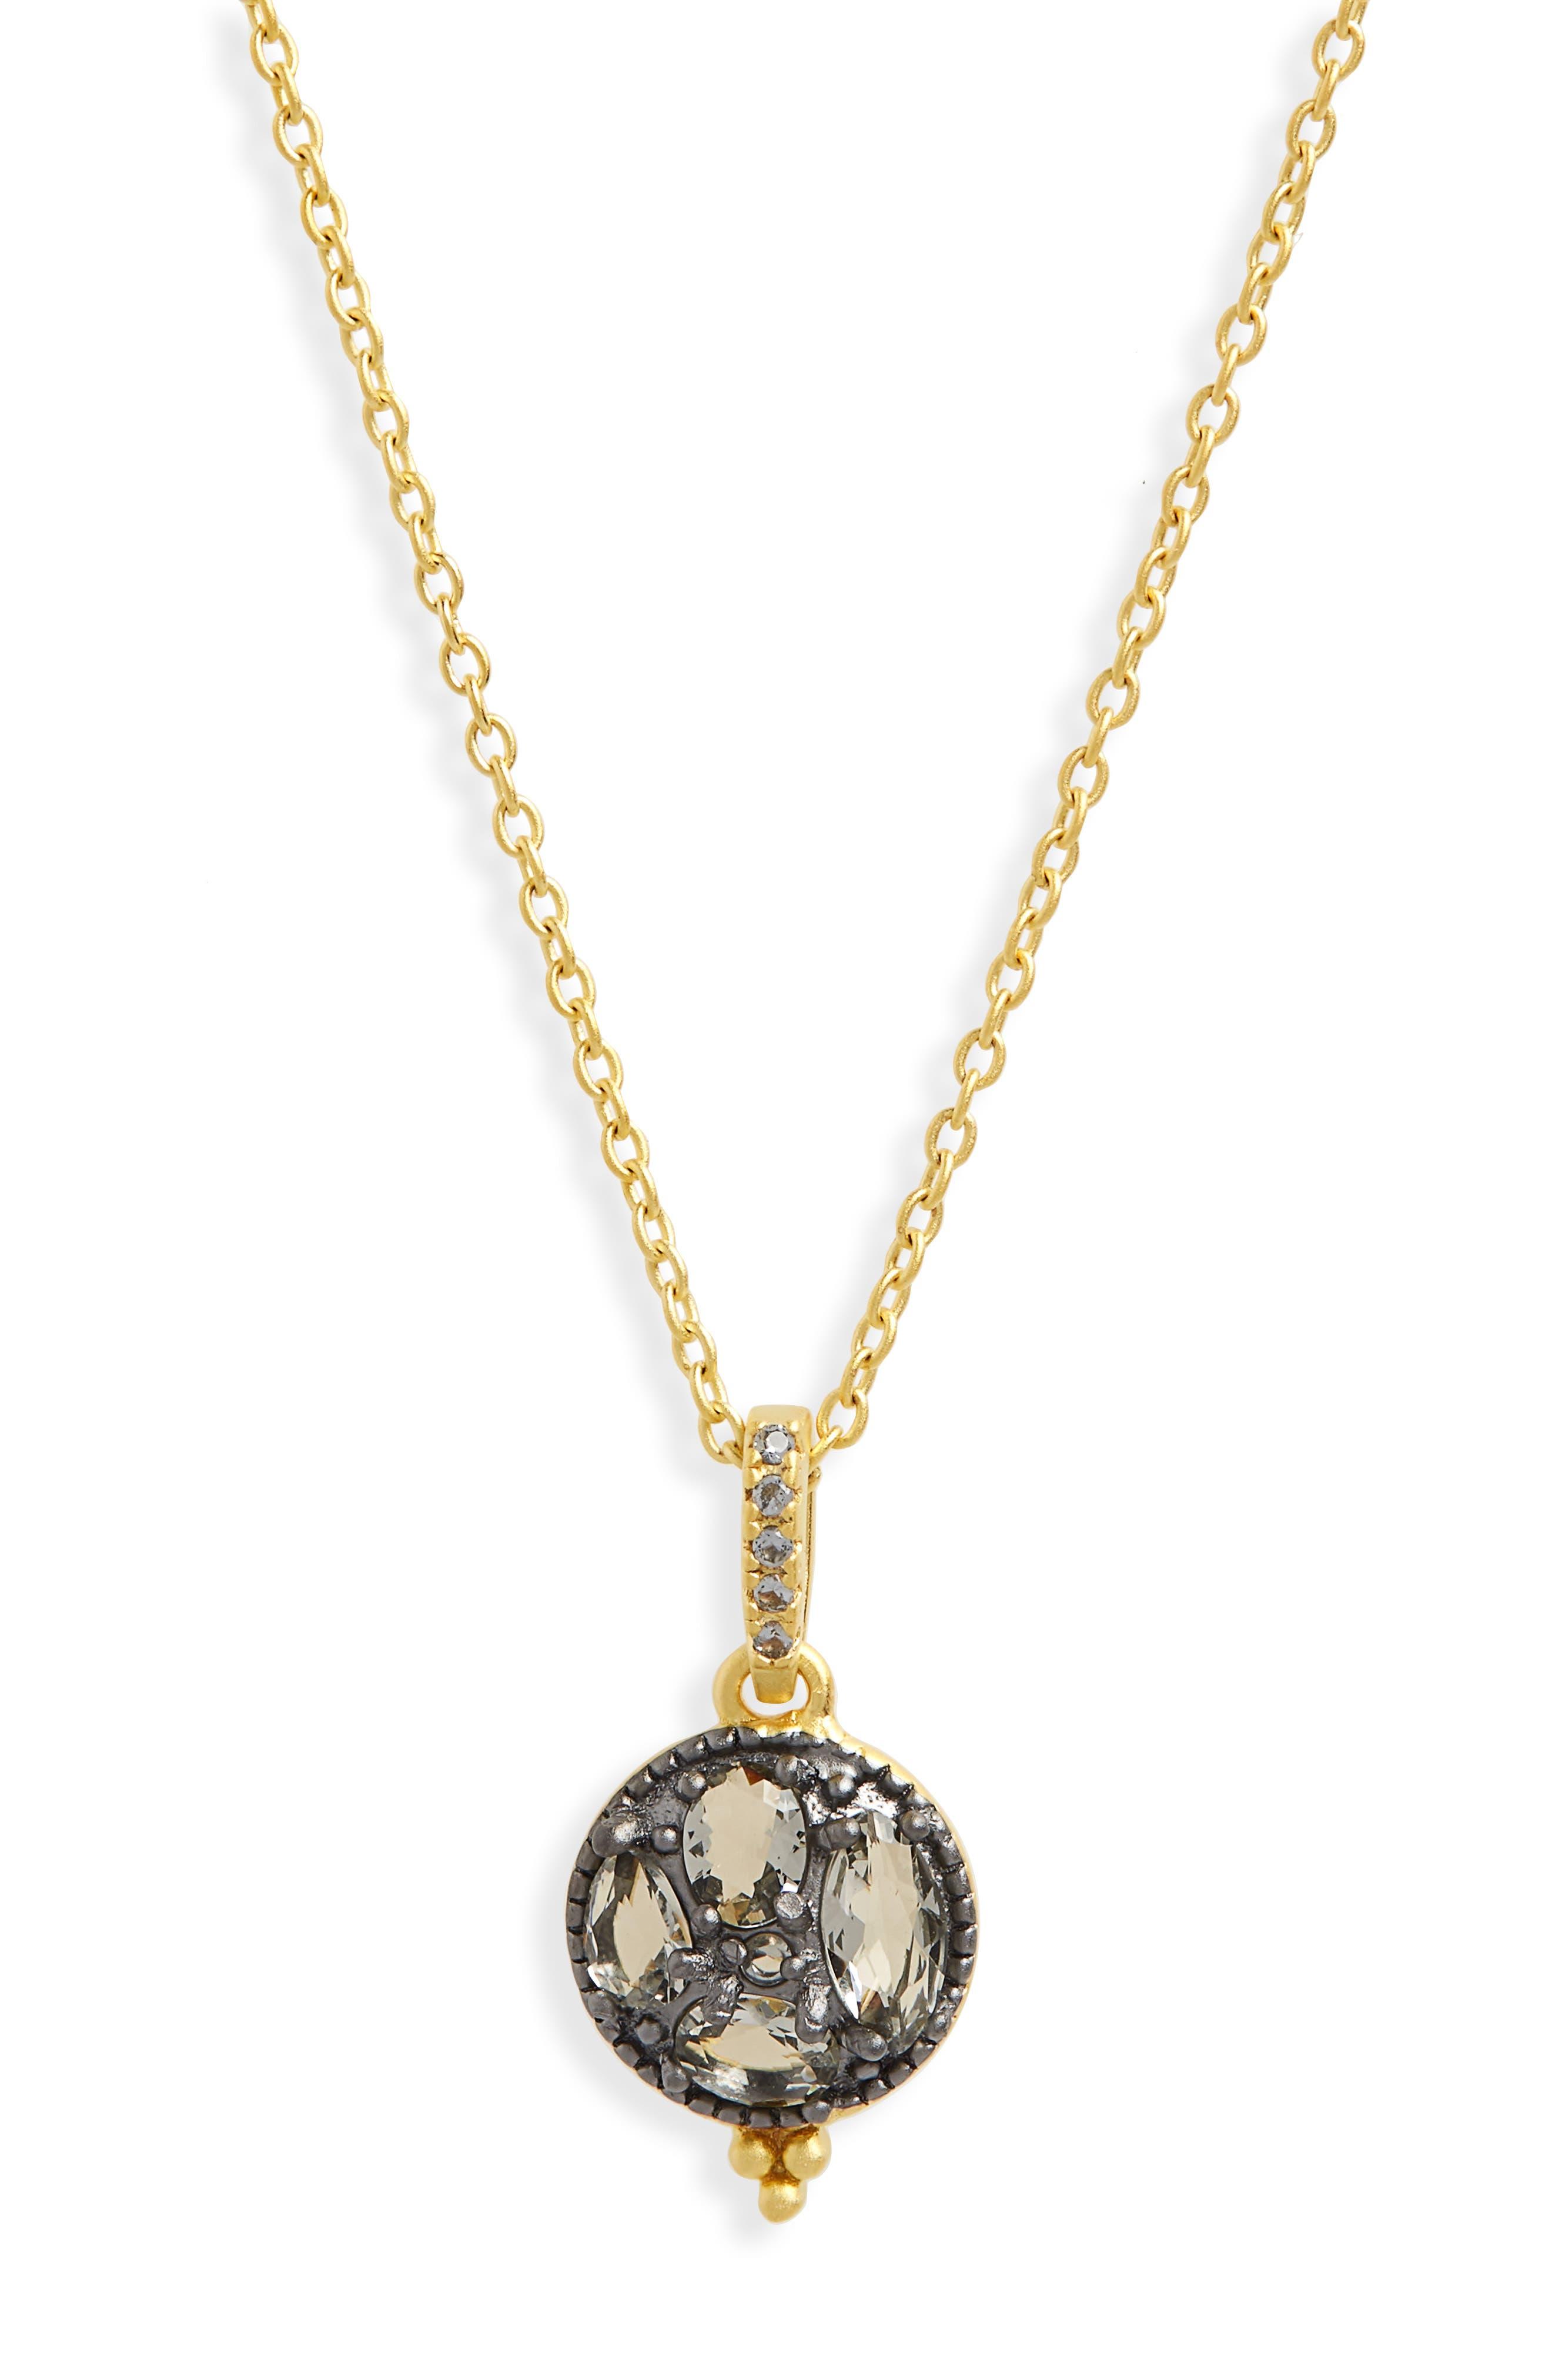 Rose Dor Small Pendant Necklace,                         Main,                         color, Black Rhodium/ Gold